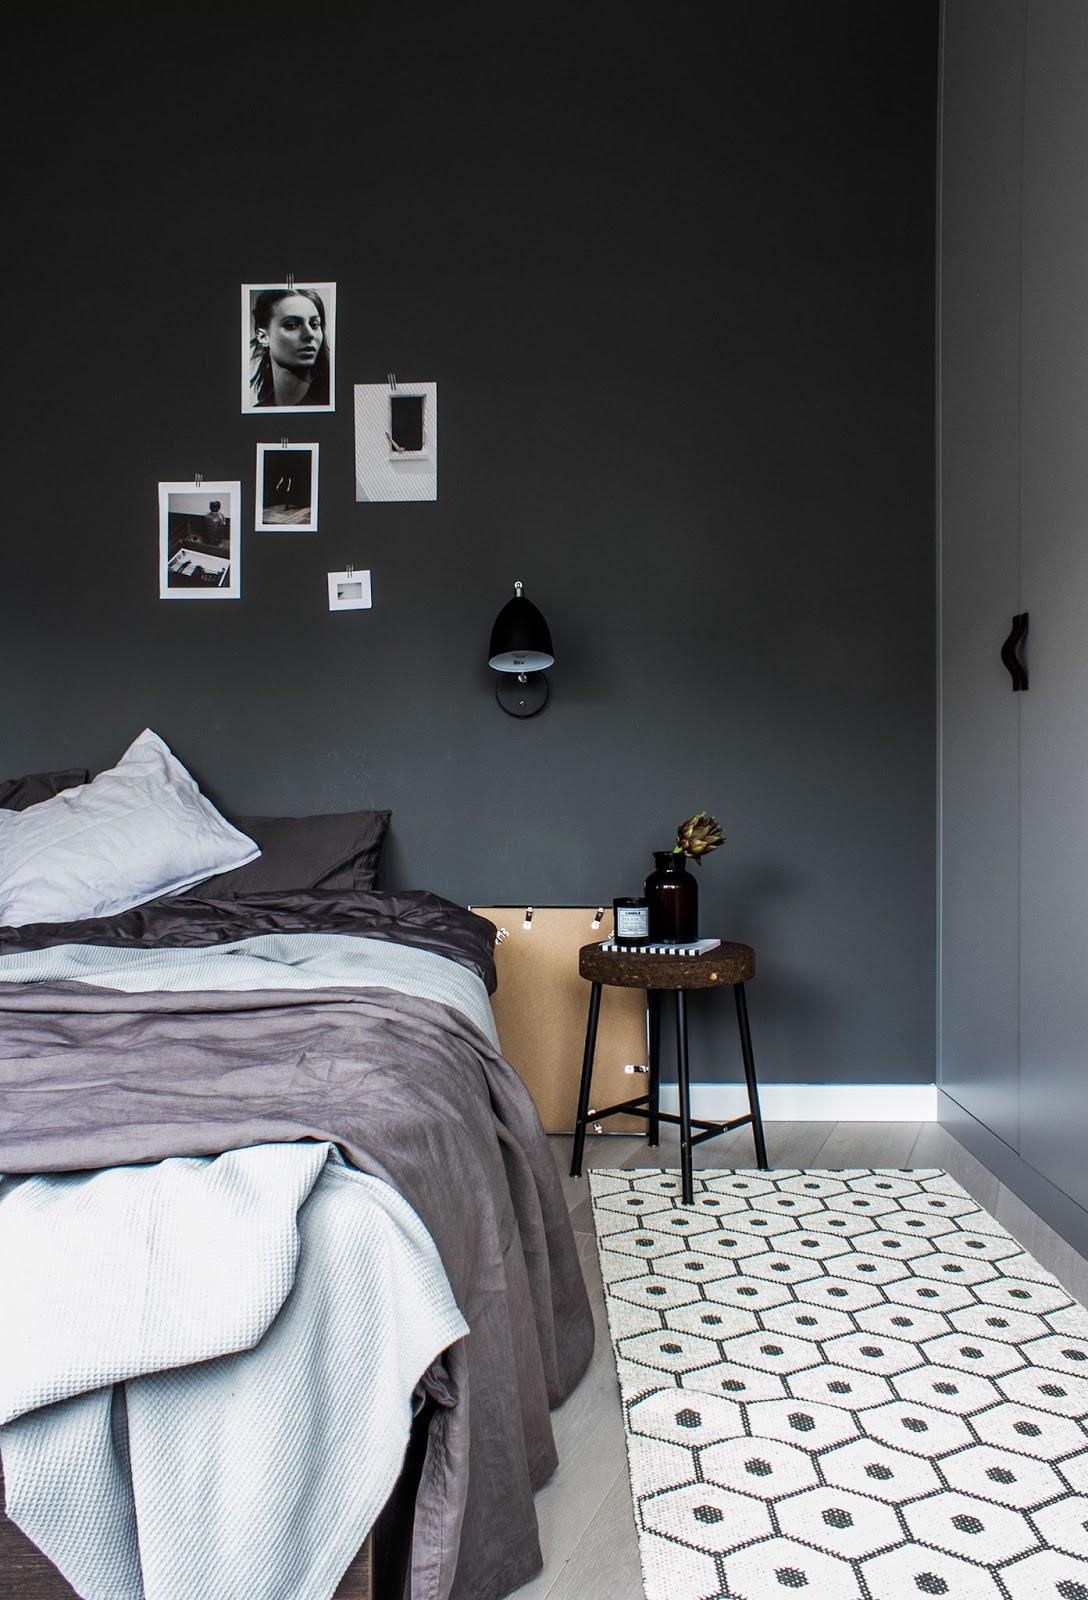 inside of a nordic bedroom, black painted walls, pattern rugs